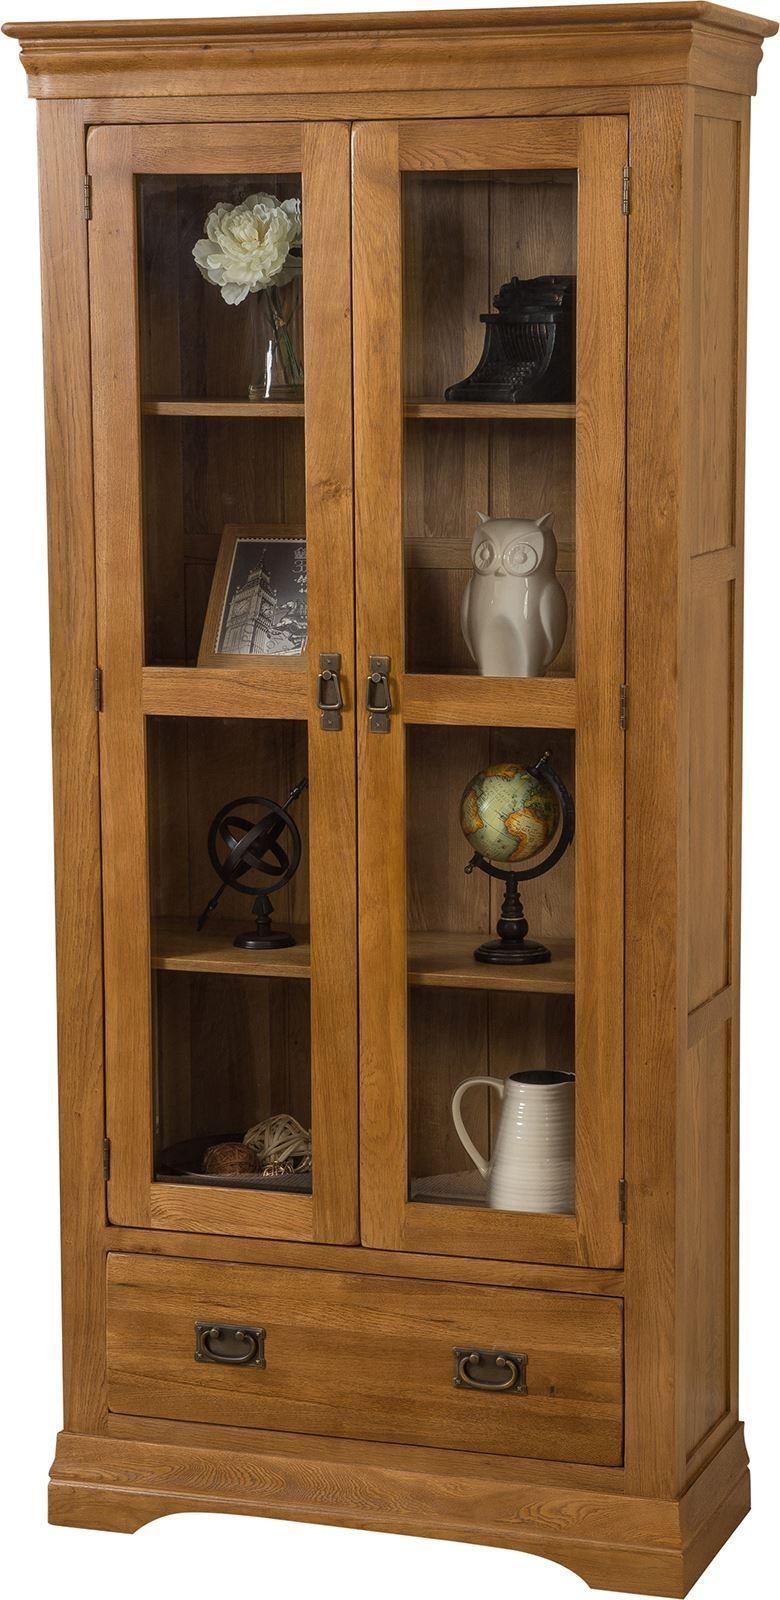 French chateau oak display cabinet modern furniture direct for Modern furniture direct